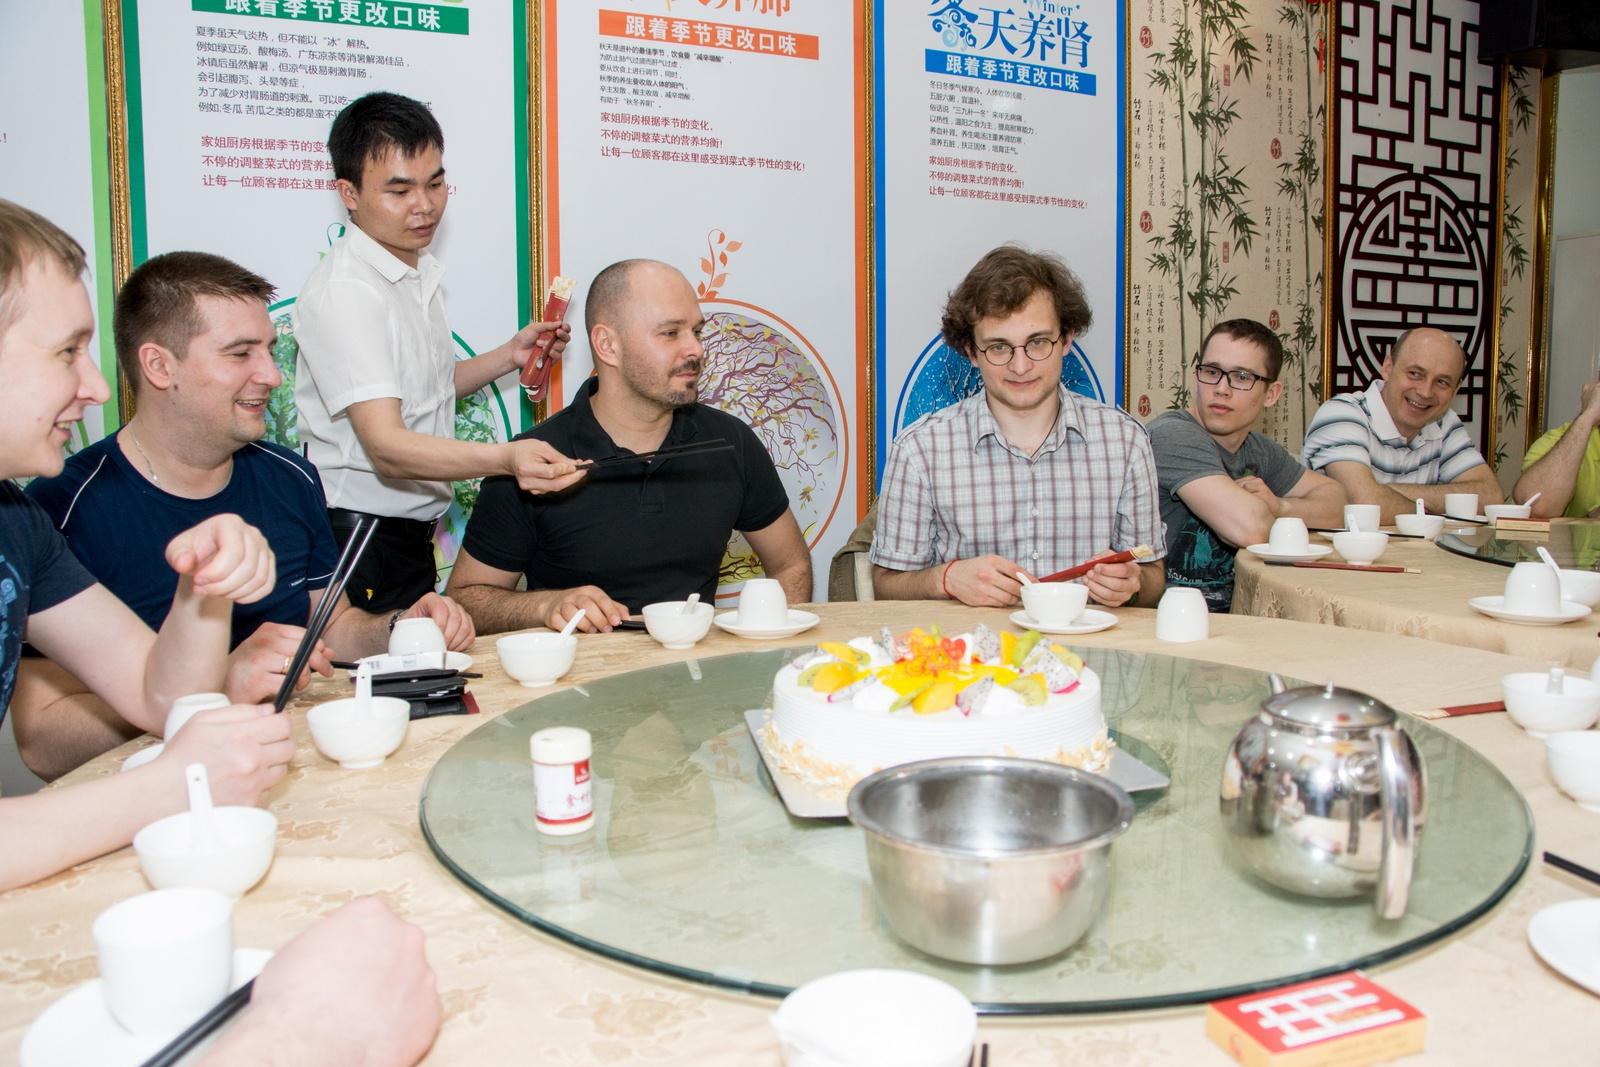 Китай. Завод устройств для «Умного дома». Учимся и учим - 9